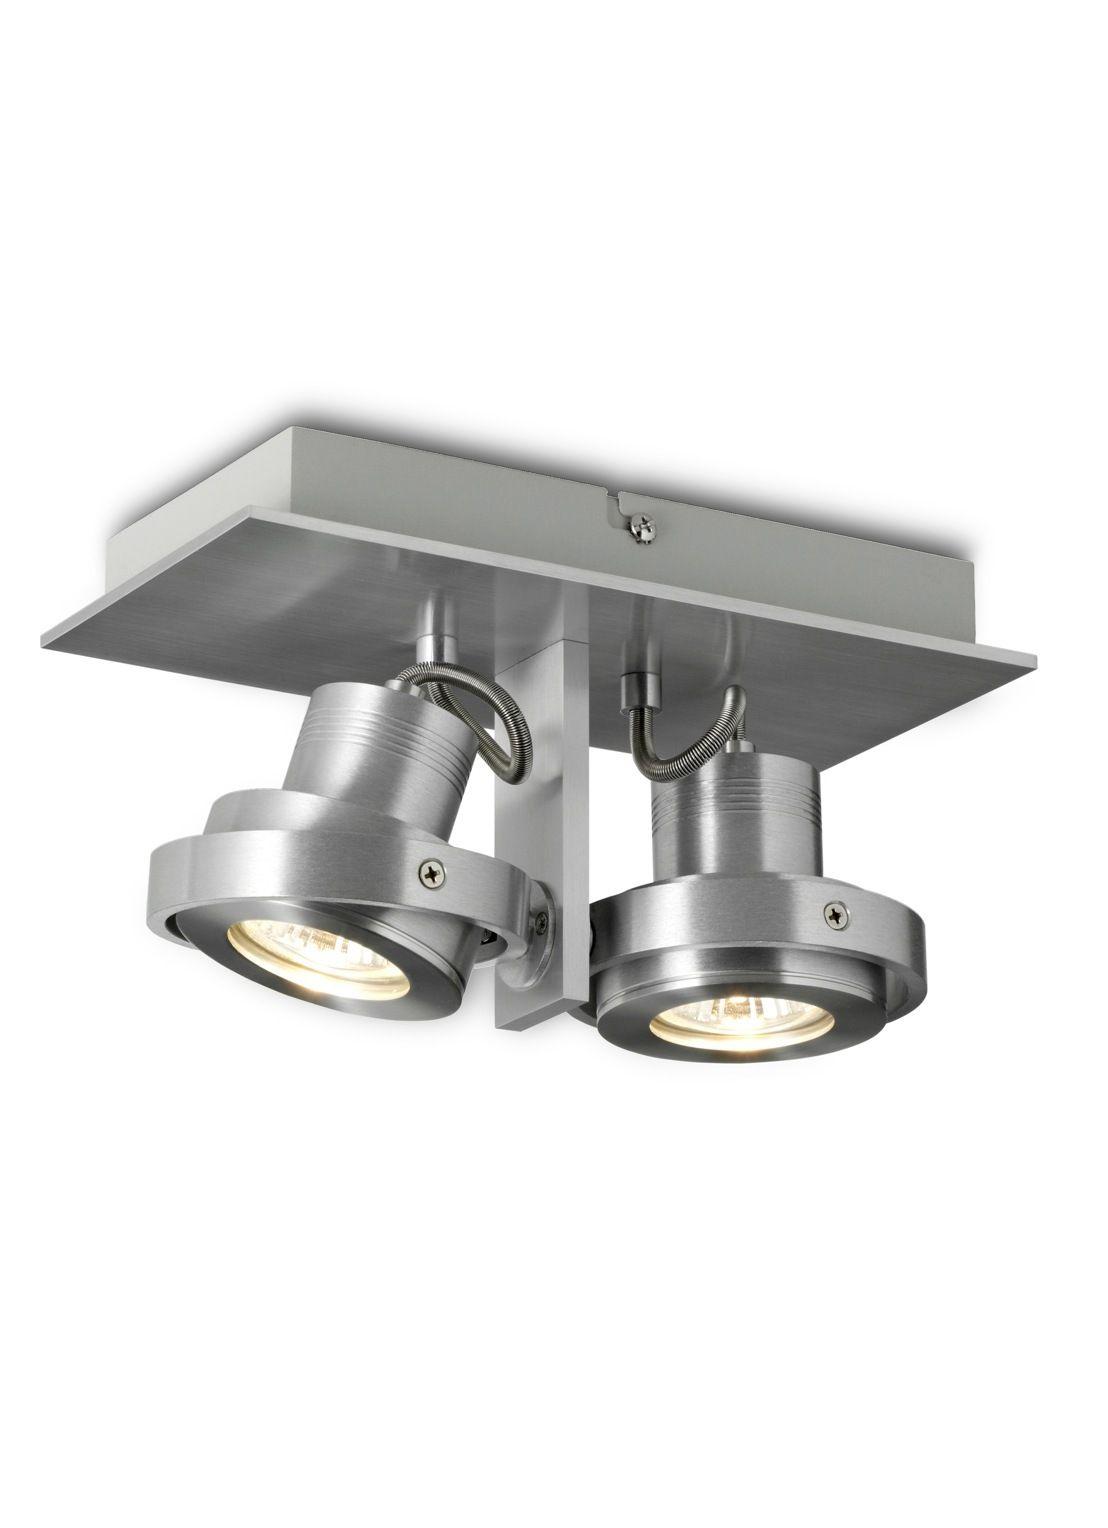 Zuiver Plafondspots LUCI. Lekker industriële lamp. Robuust model ...